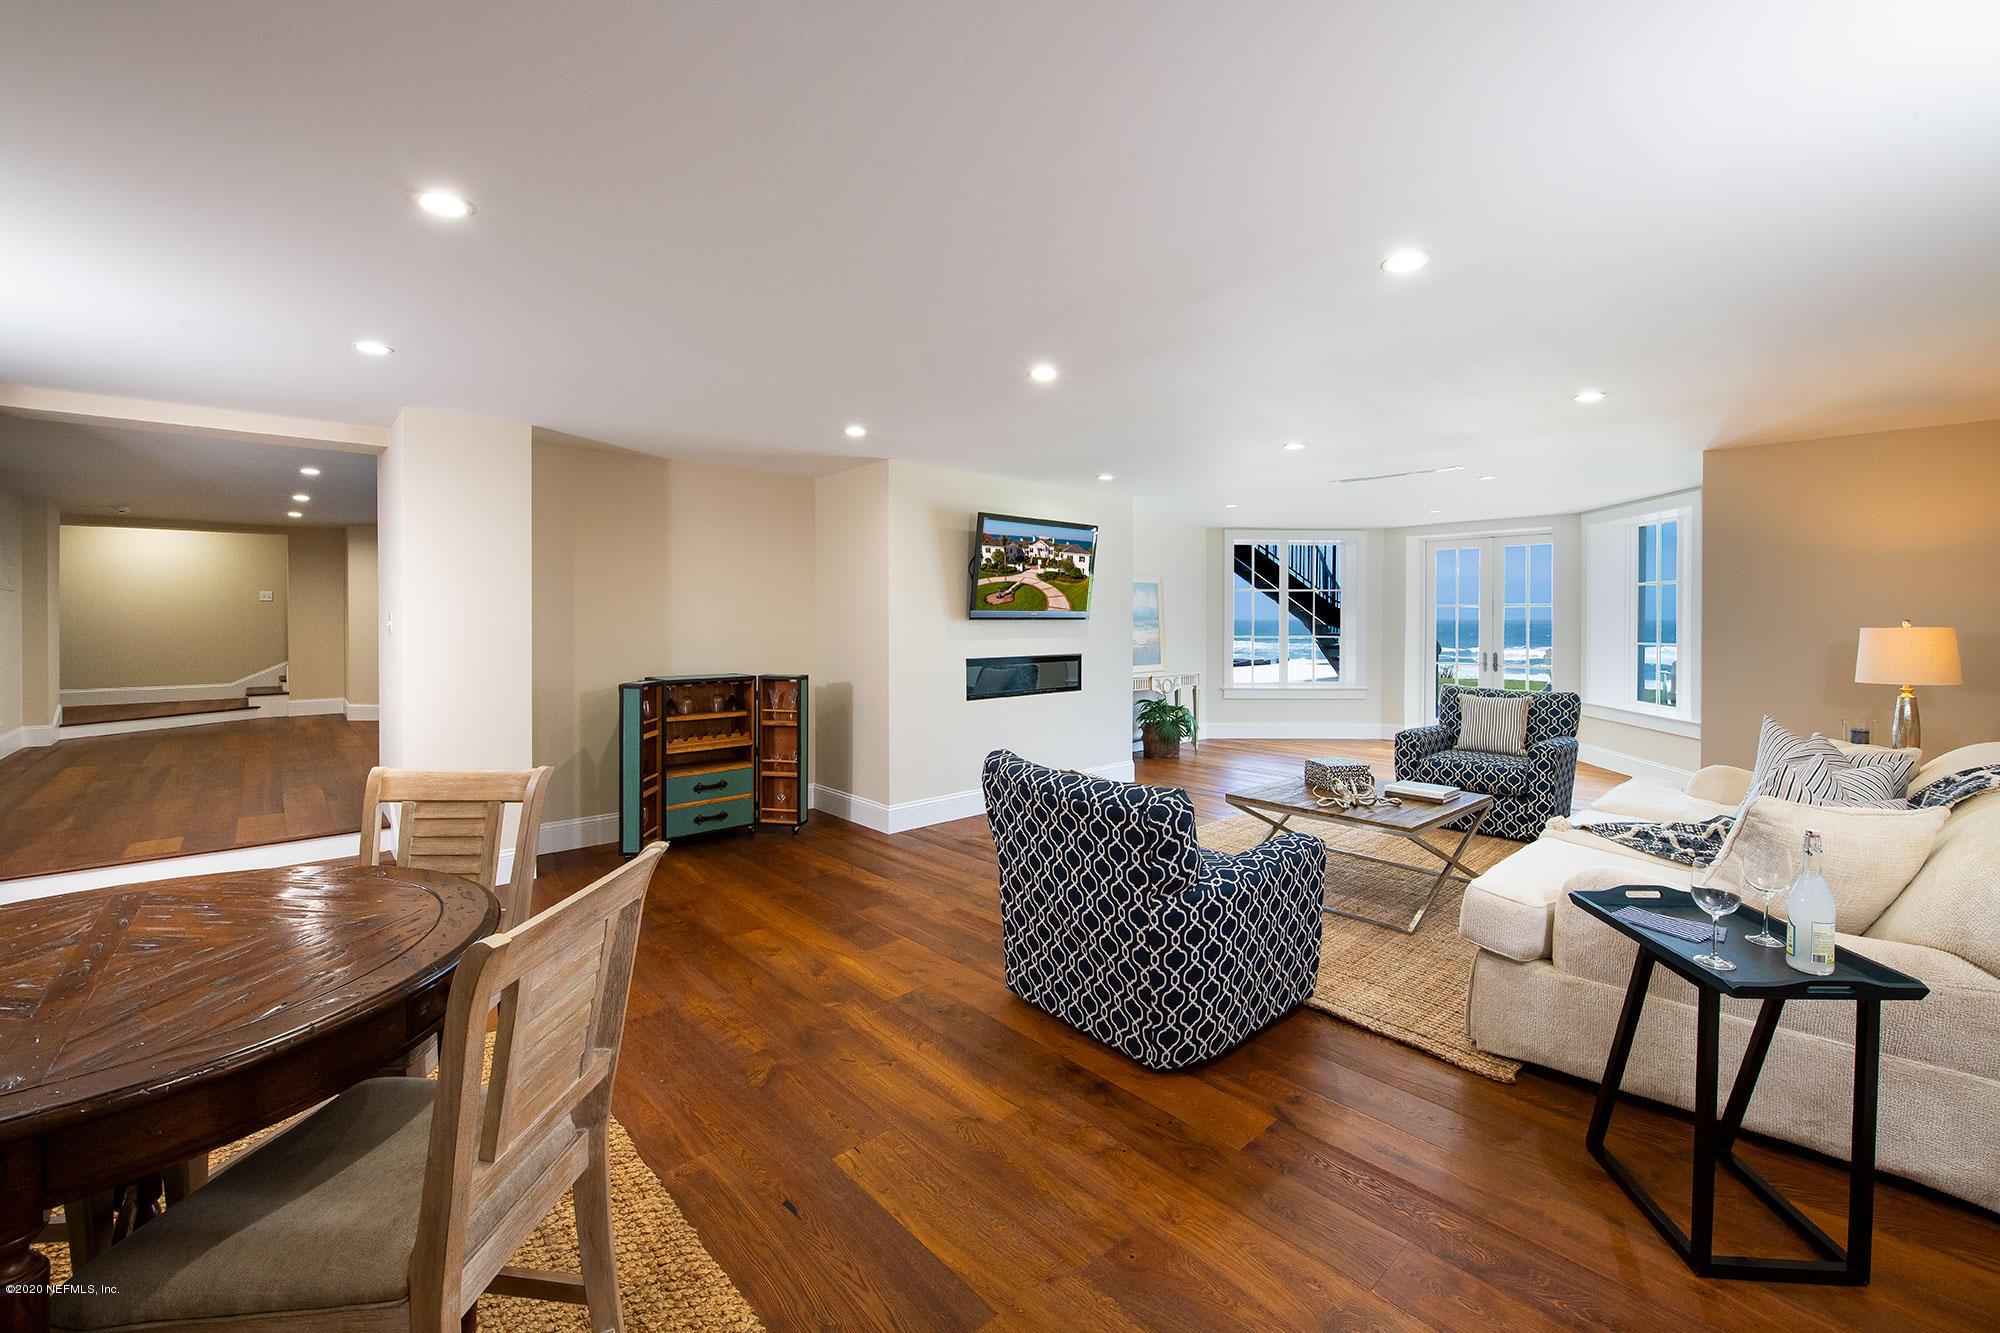 1063 PONTE VEDRA, PONTE VEDRA BEACH, FLORIDA 32082, 5 Bedrooms Bedrooms, ,5 BathroomsBathrooms,Residential,For sale,PONTE VEDRA,1054214